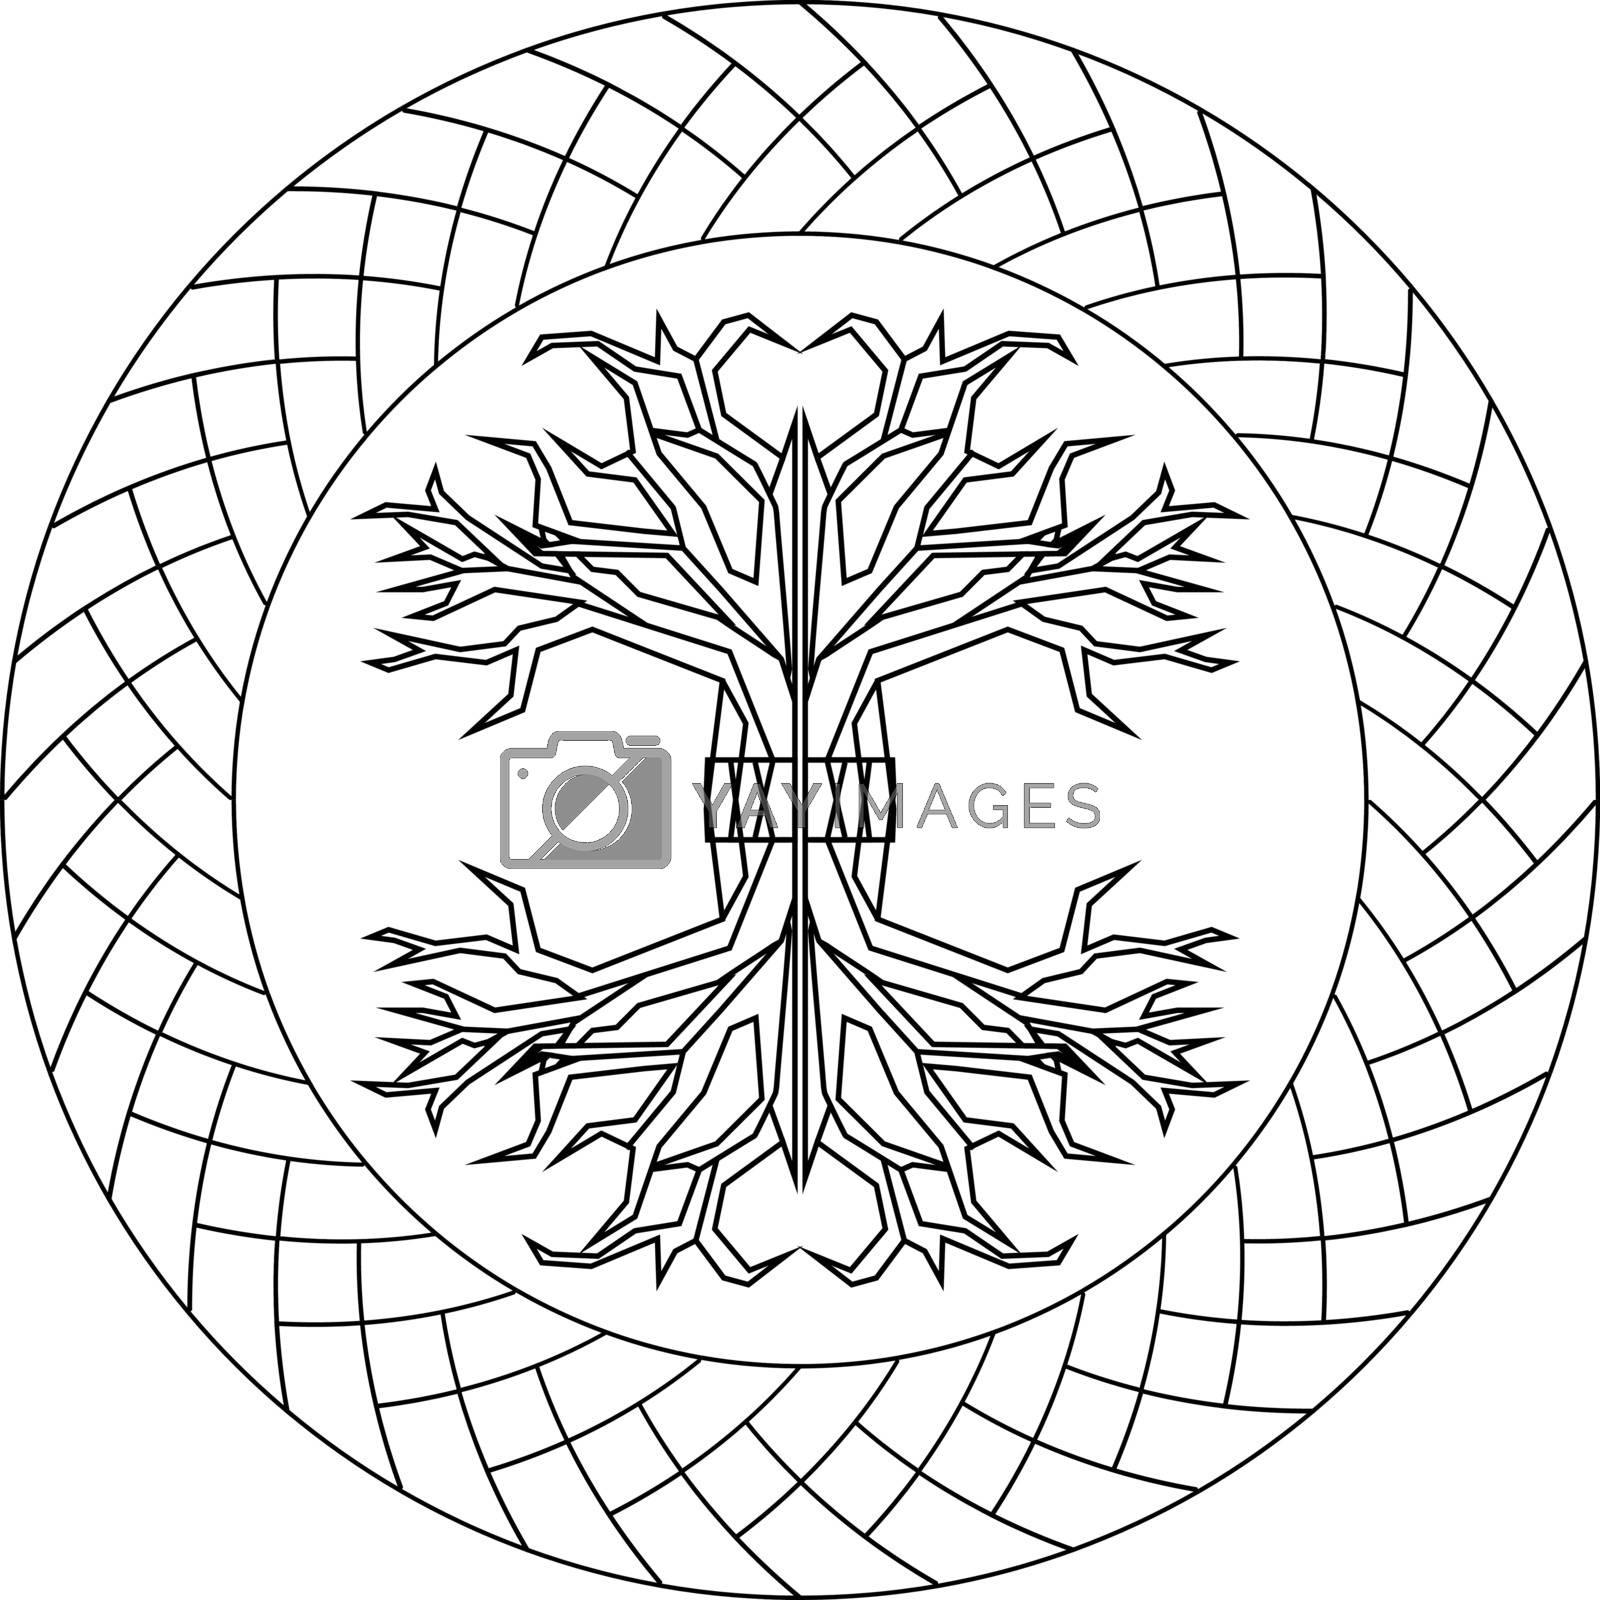 Contour old scandinavian pagan tree of life yggdrasil in ornamented circle